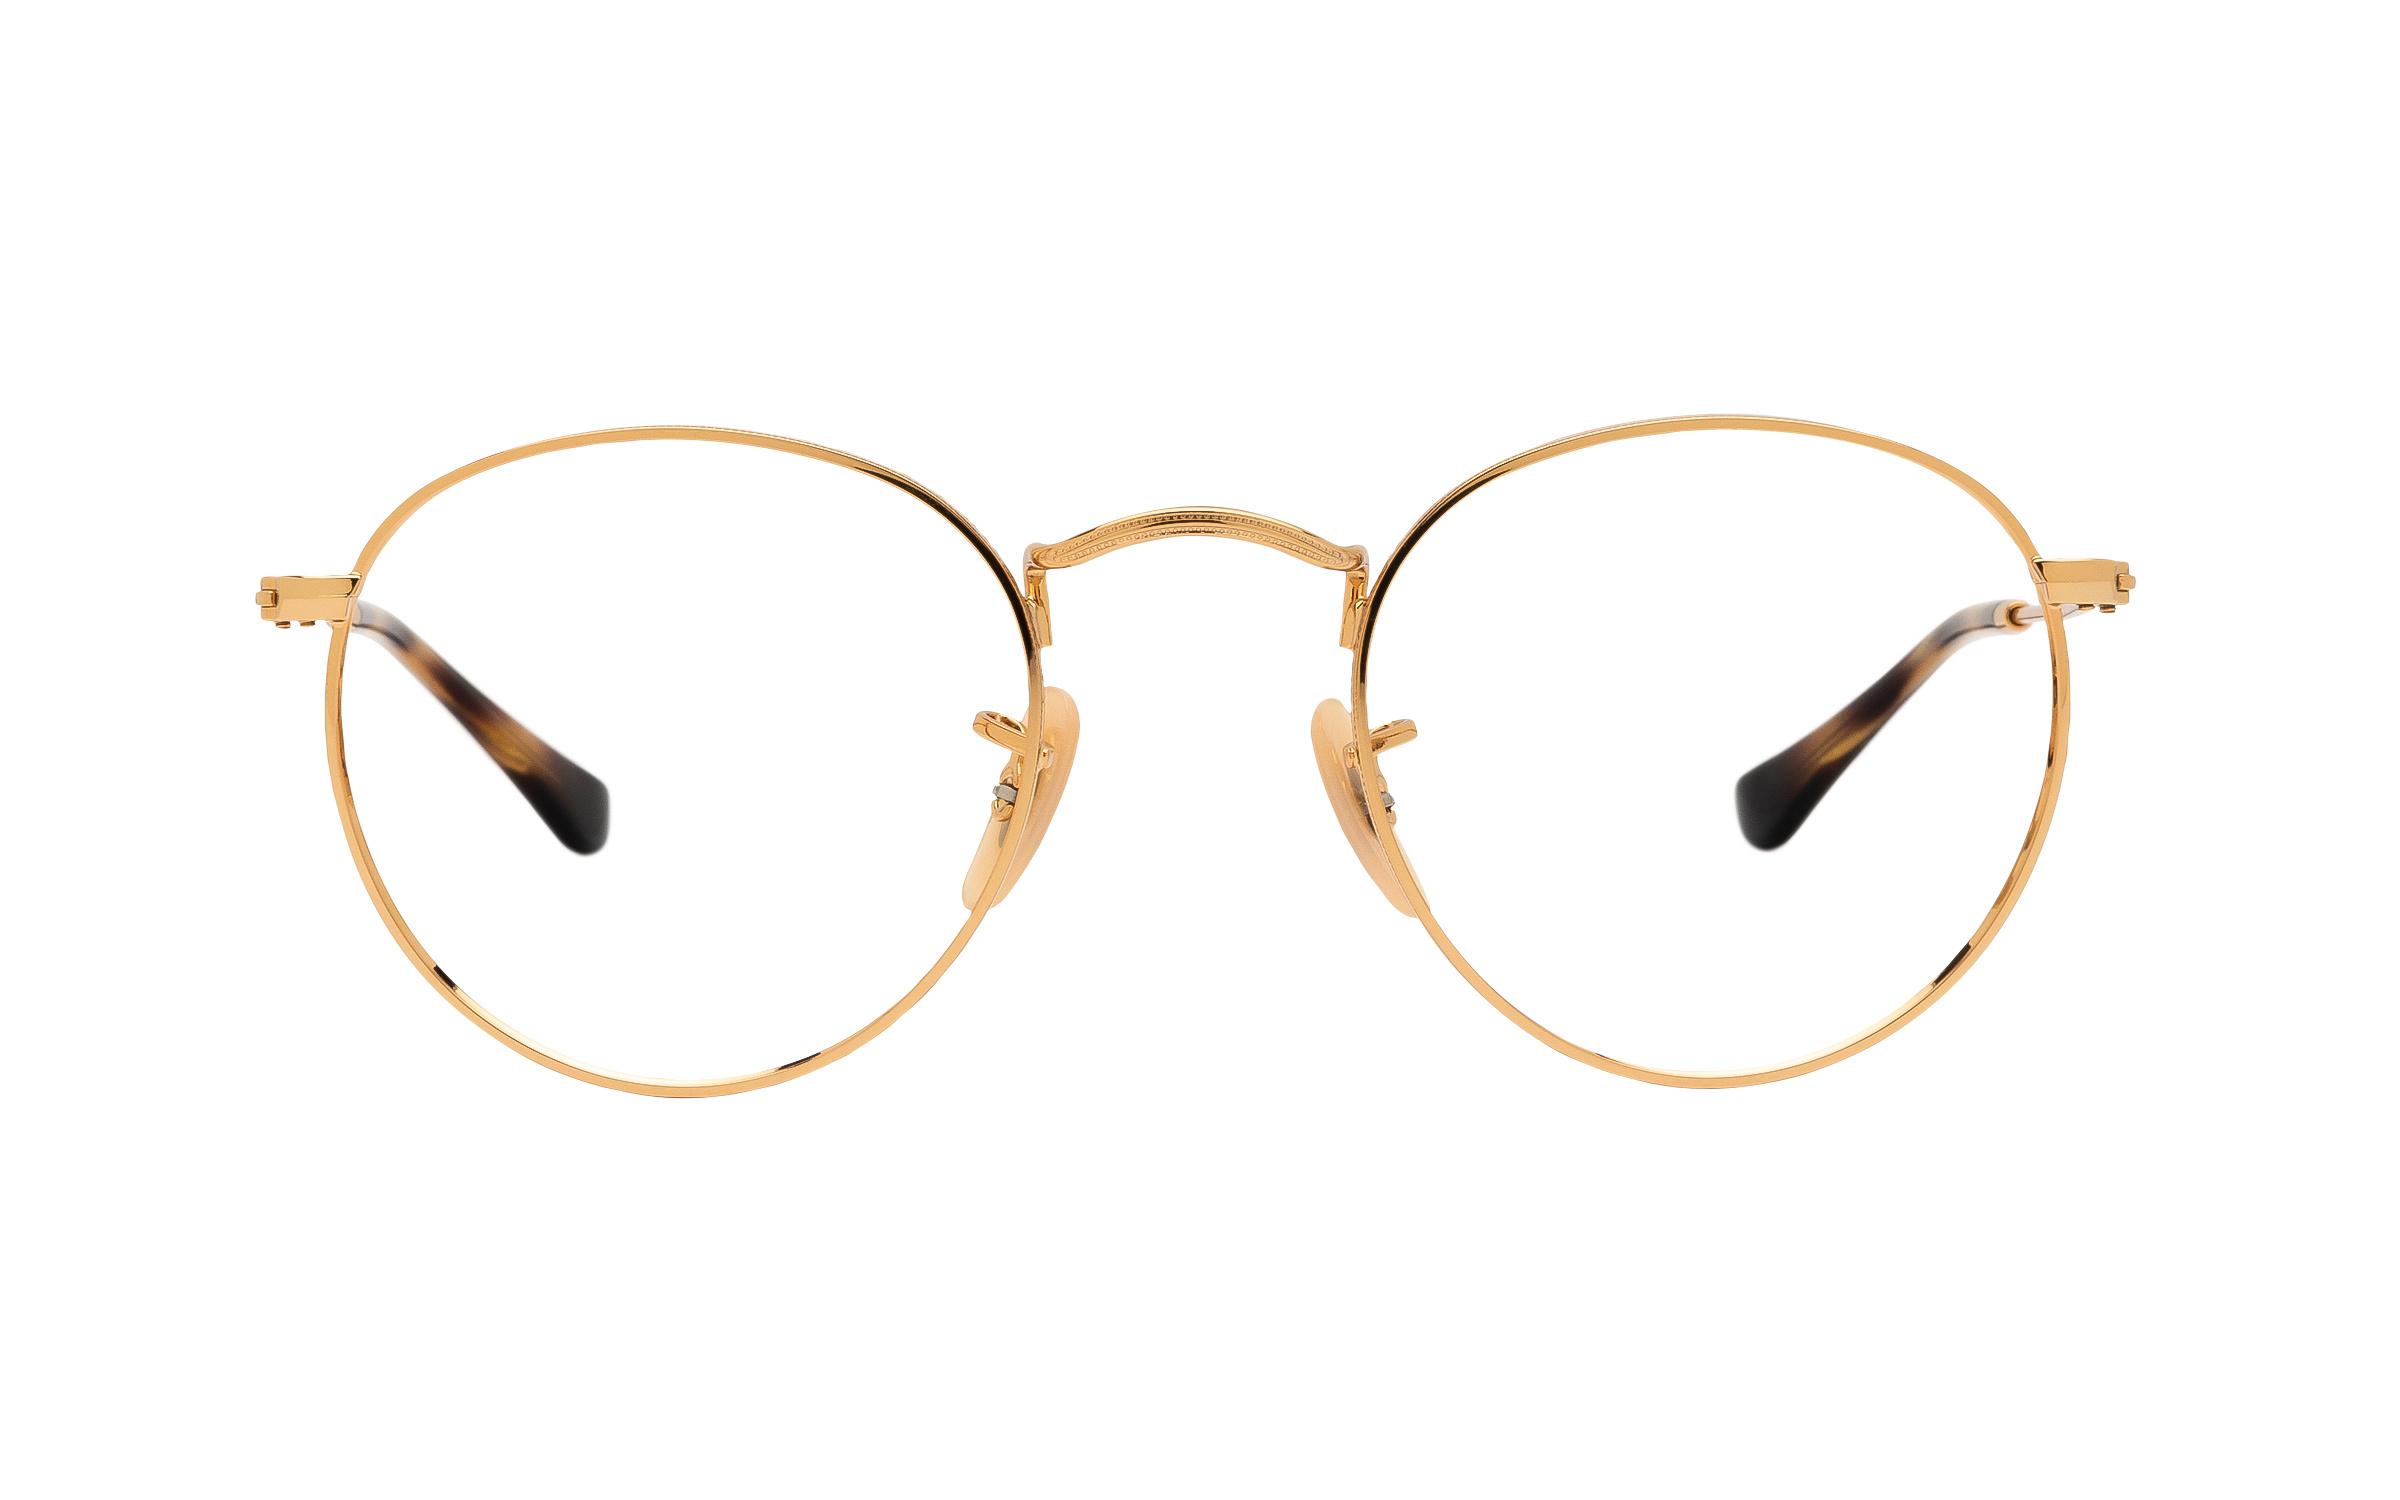 http://www.coastal.com/ - Ray-Ban RX3447V 2500 (47) Eyeglasses and Frame in Gold | Metal – Online Coastal